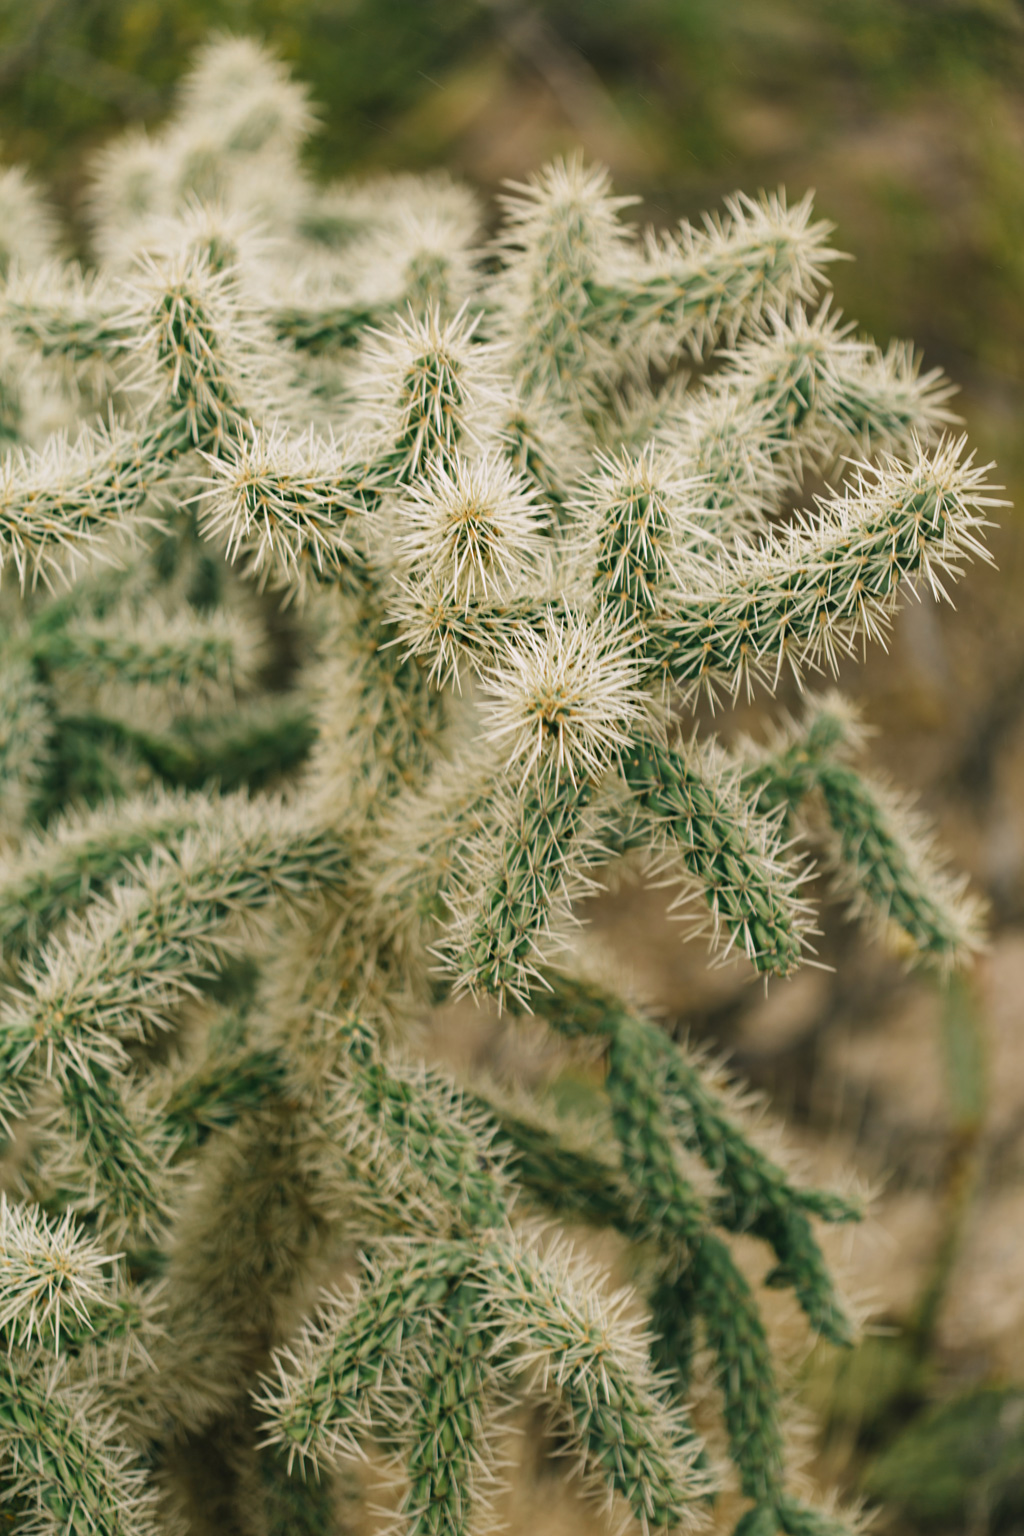 CindyGiovagnoli_Saguaro_National_Park_Tucson_Arizona_flowers_rain_spring_desert-008.jpg